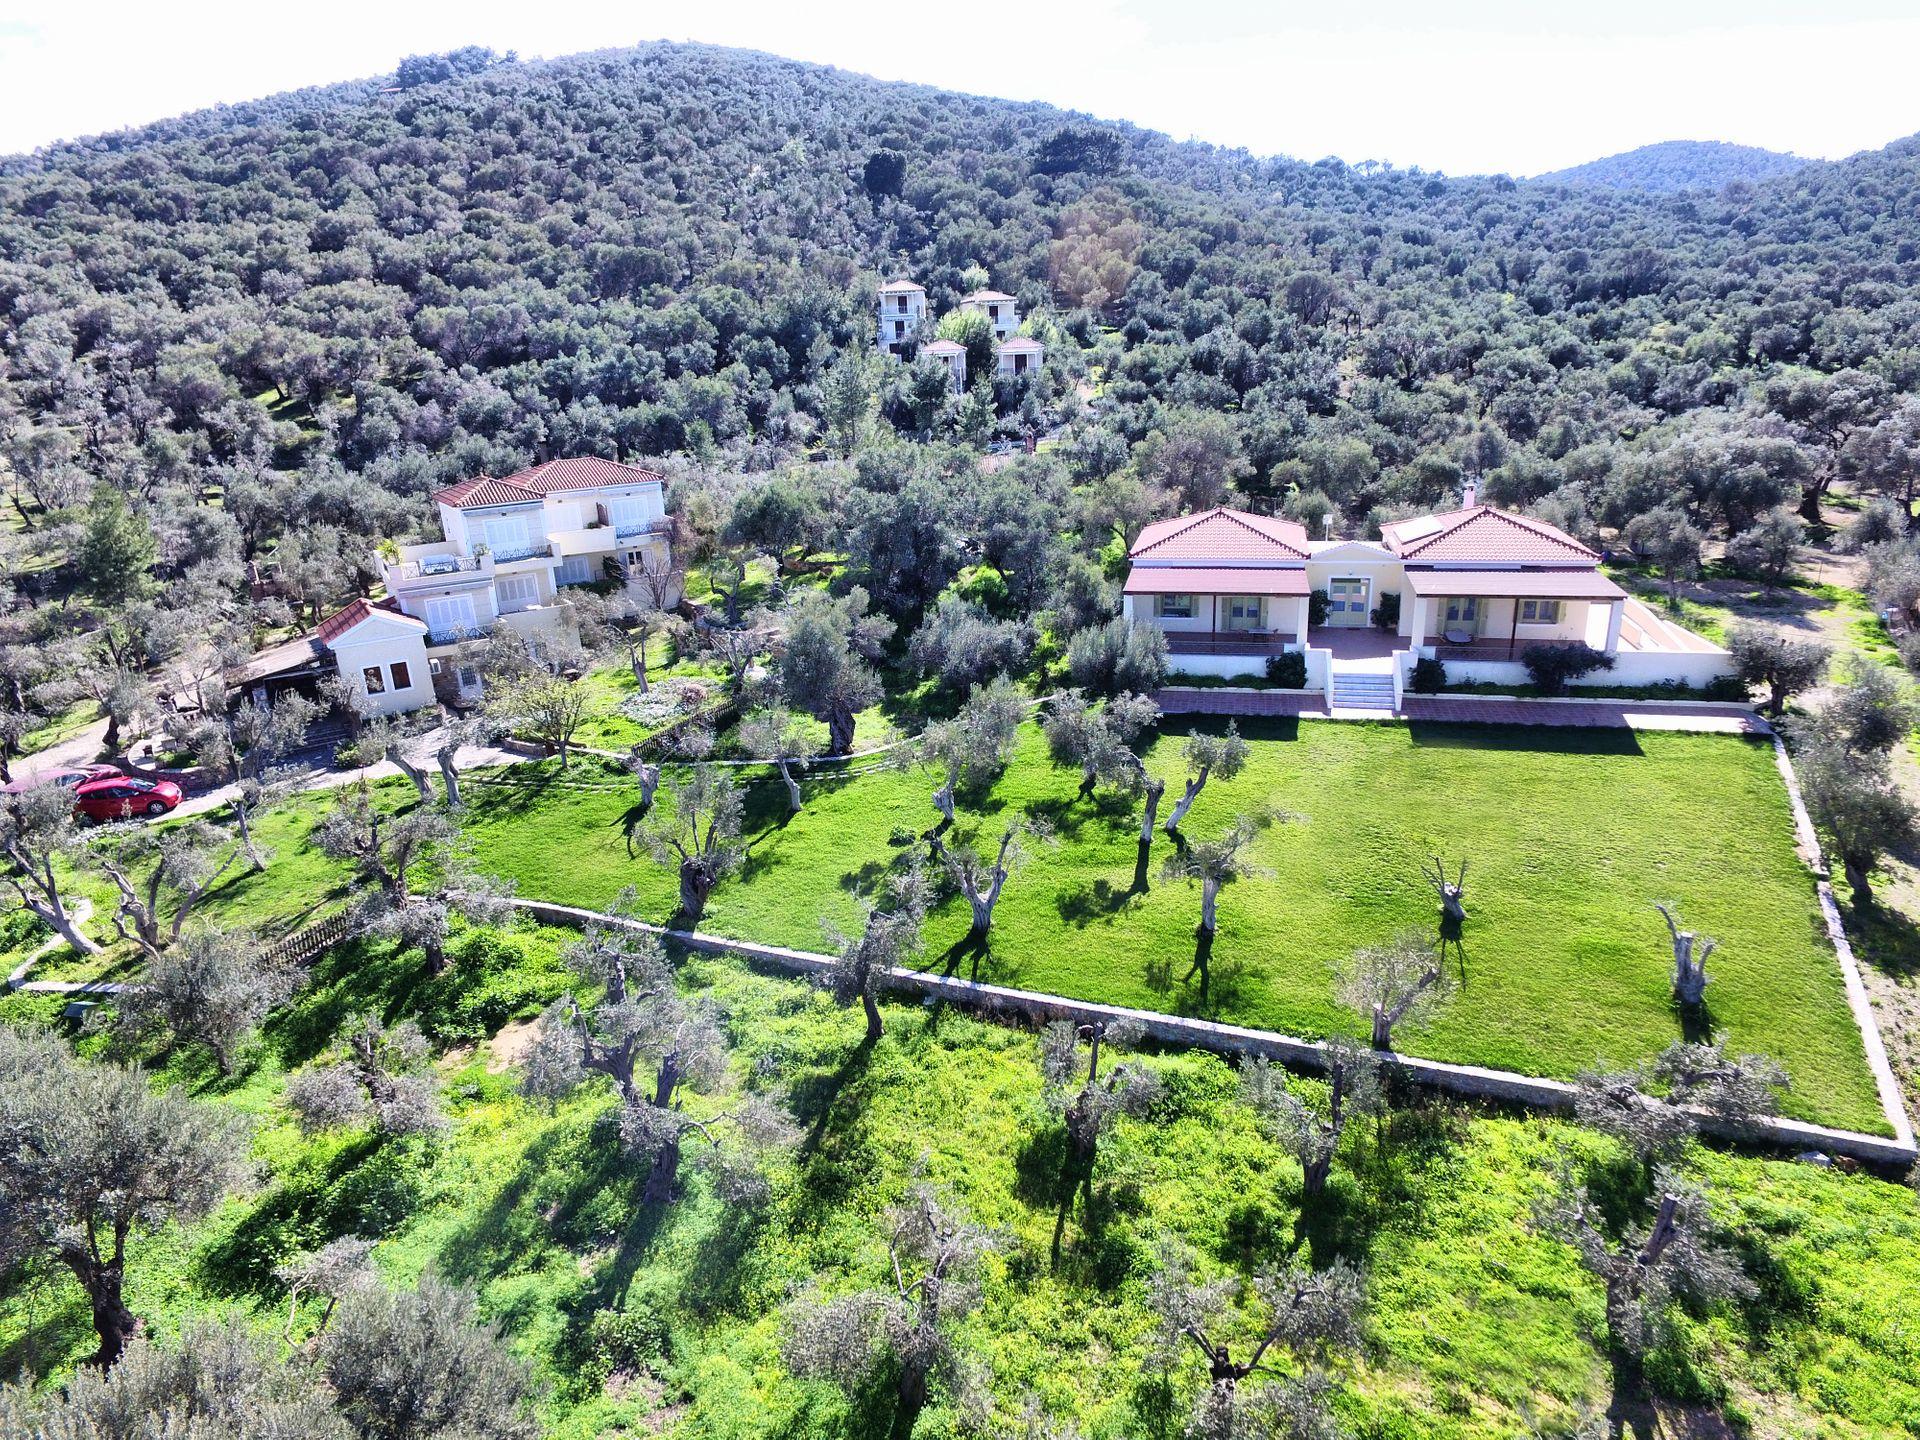 Gera's Olive Grove (Elaionas Tis Geras) - Μυτιλήνη ✦ 2 Ημέρες (1 Διανυκτέρευση) ✦ 2 άτομα + 1 παιδί έως 2 ετών ✦ Χωρίς Πρωινό ✦ 01/09/2021 έως 30/09/2021 ✦ Υπέροχη Τοποθεσία!